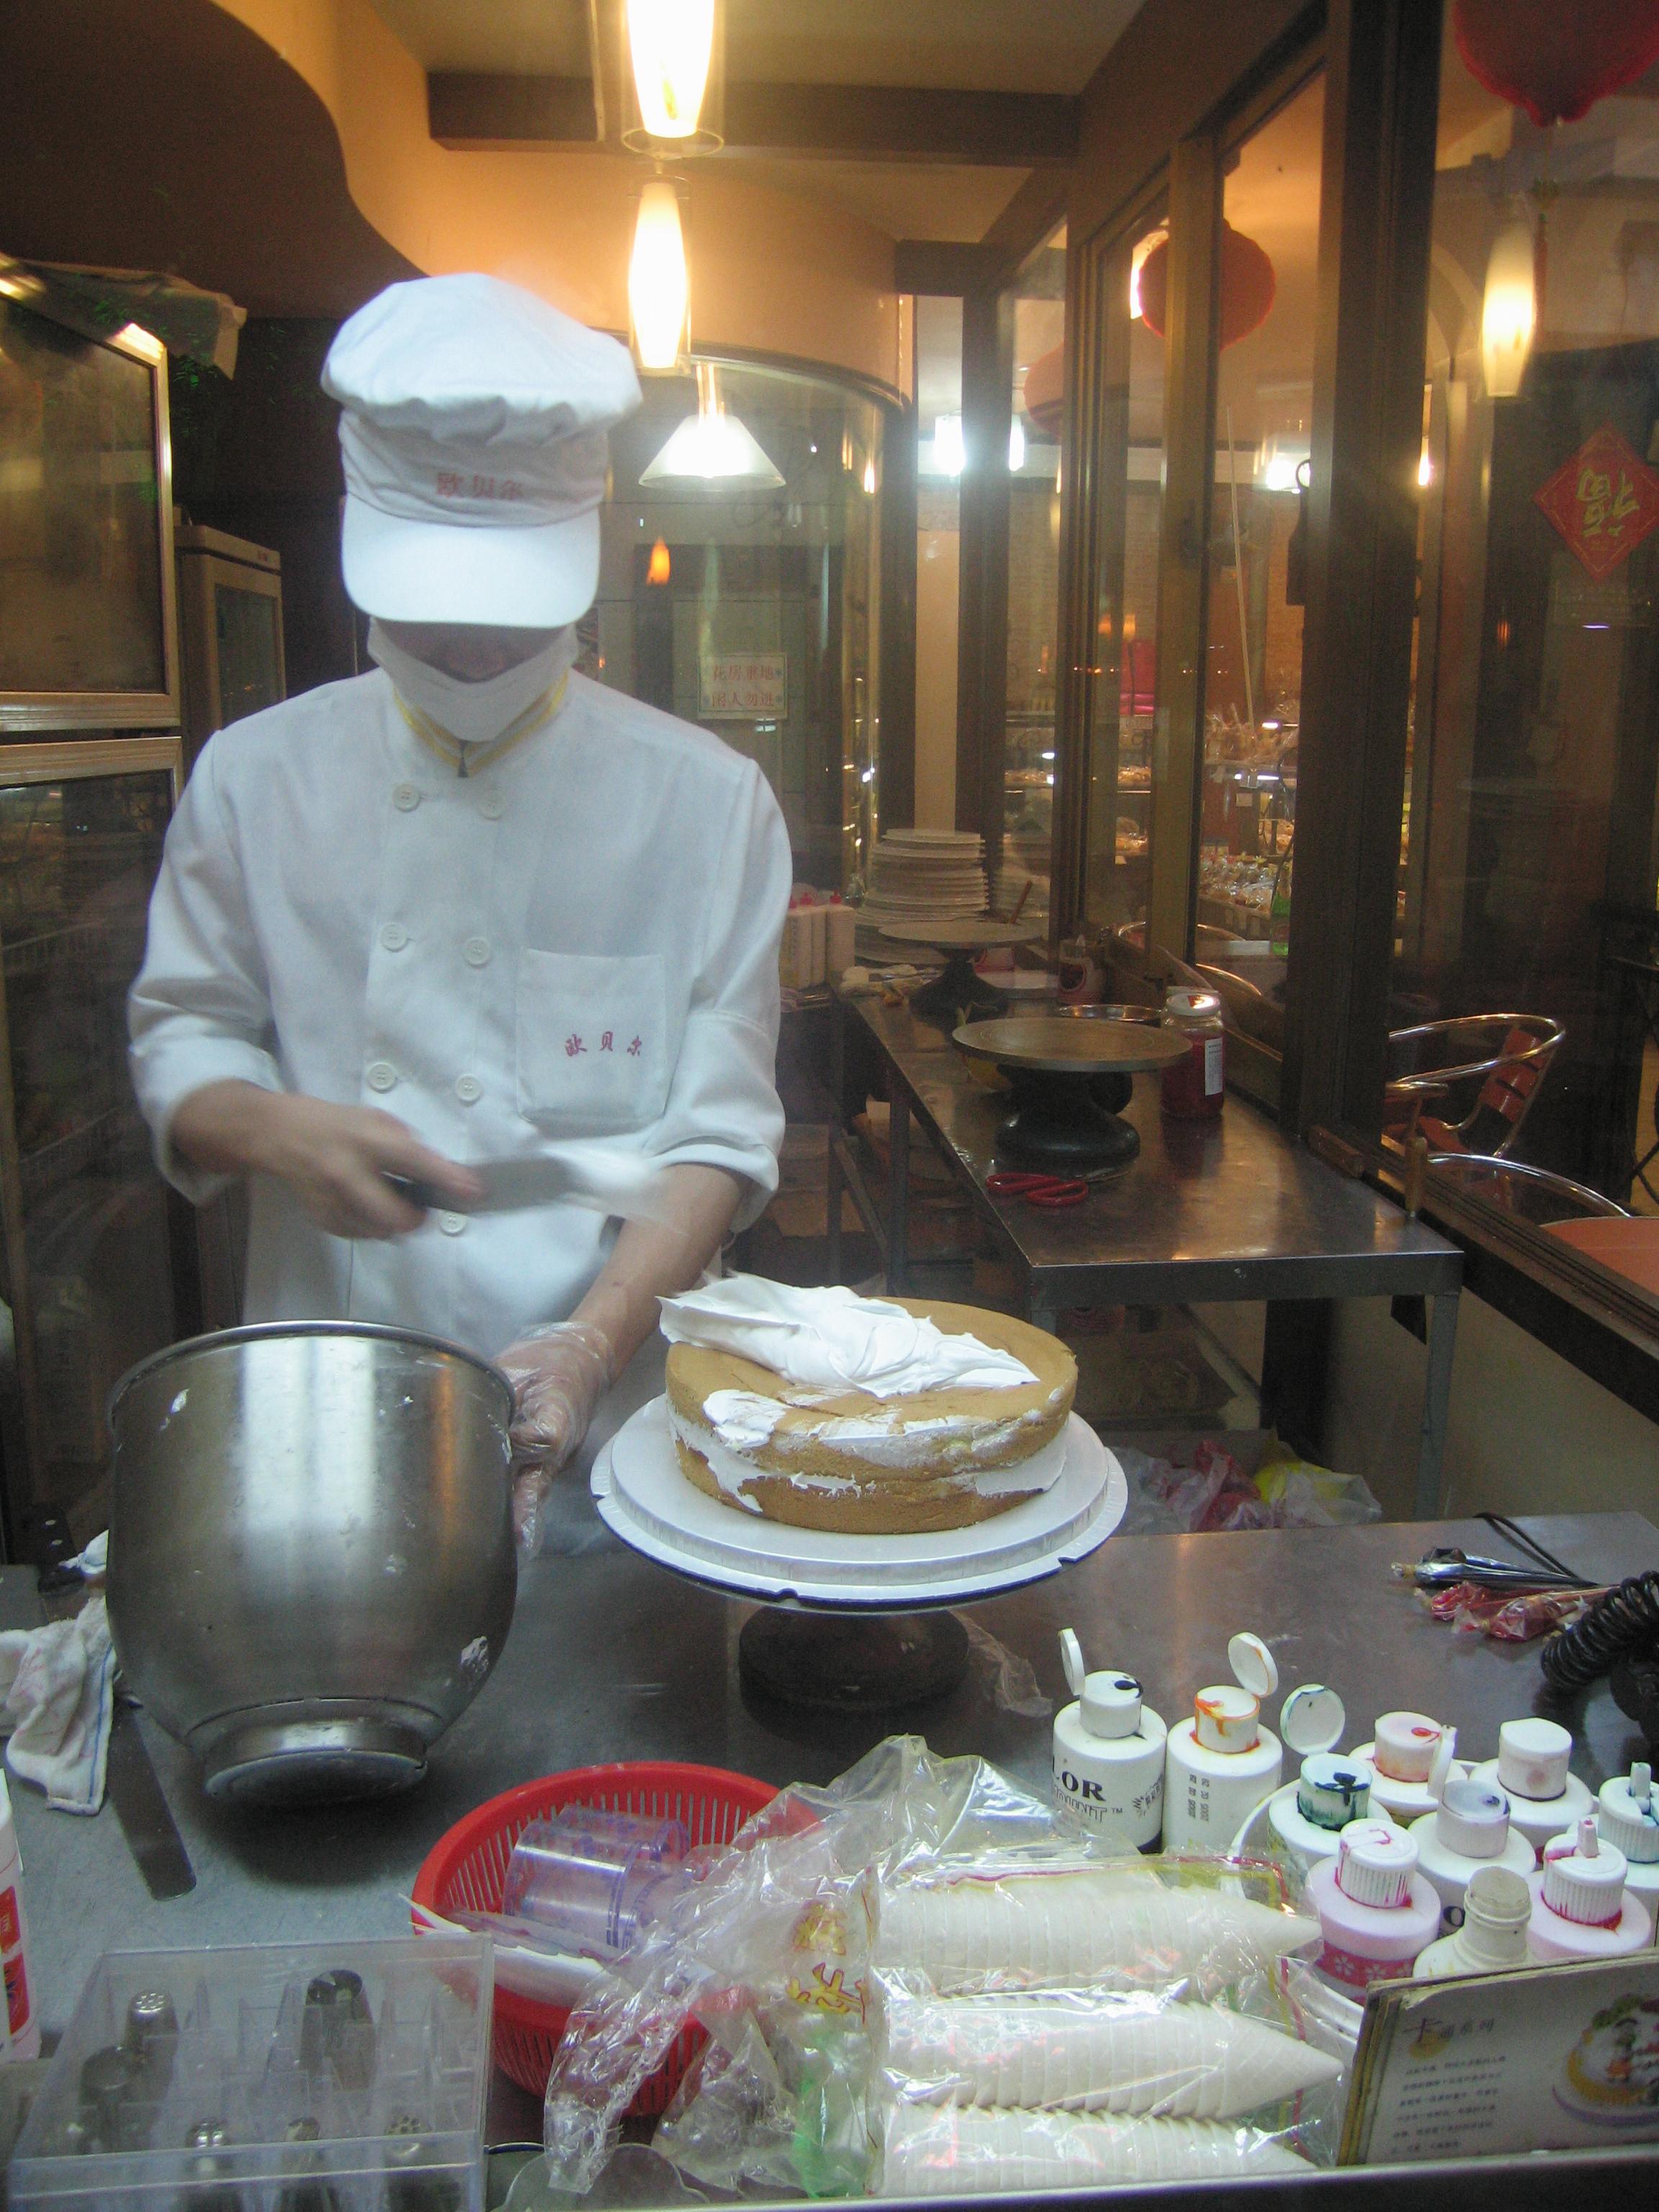 filecake decoratorjpg - Cake Decorator